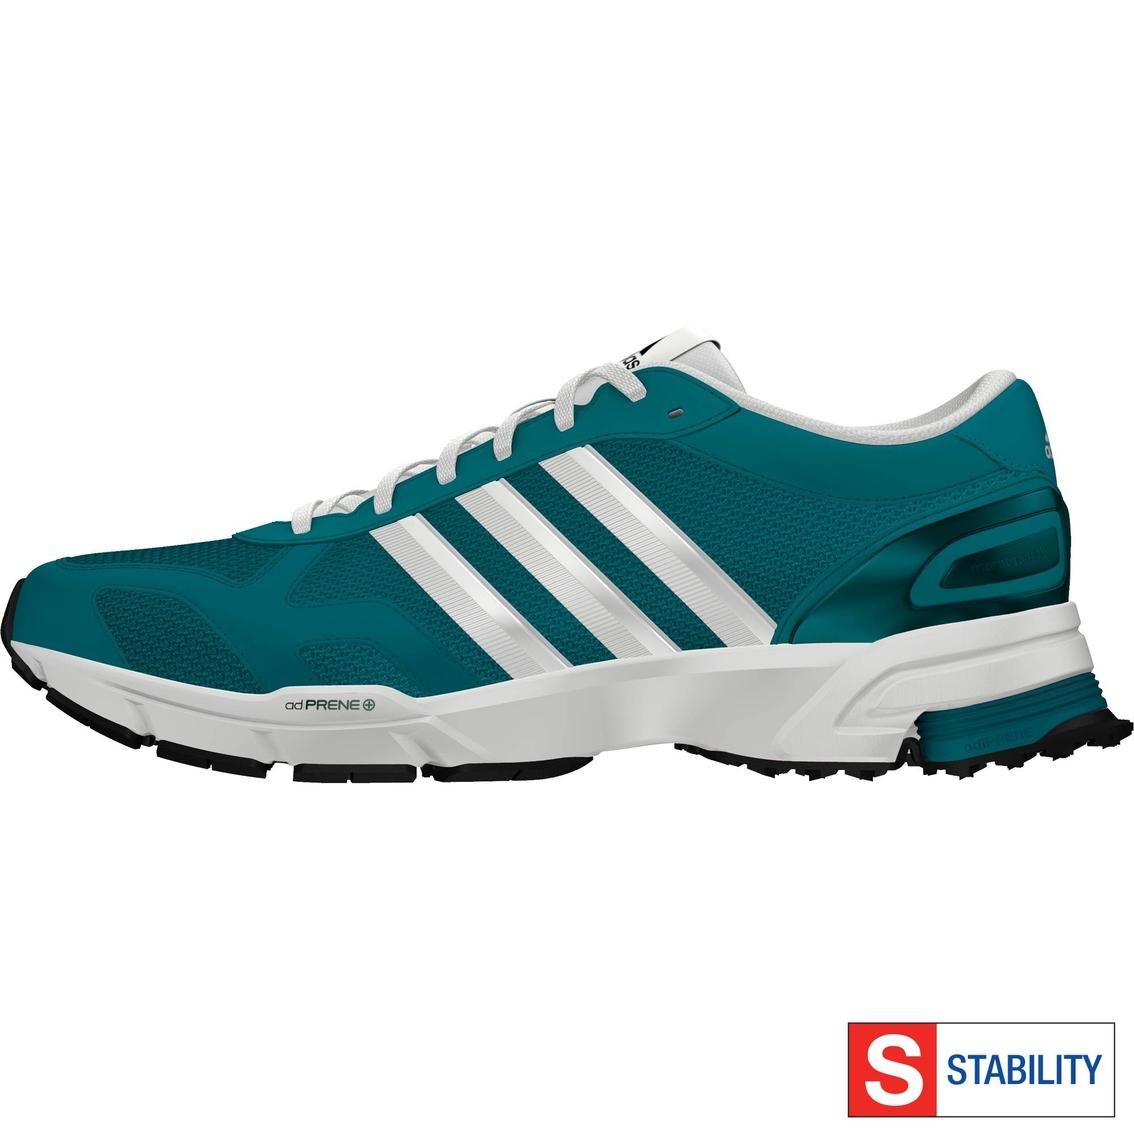 adidas s marathon 10 running shoes running shoes